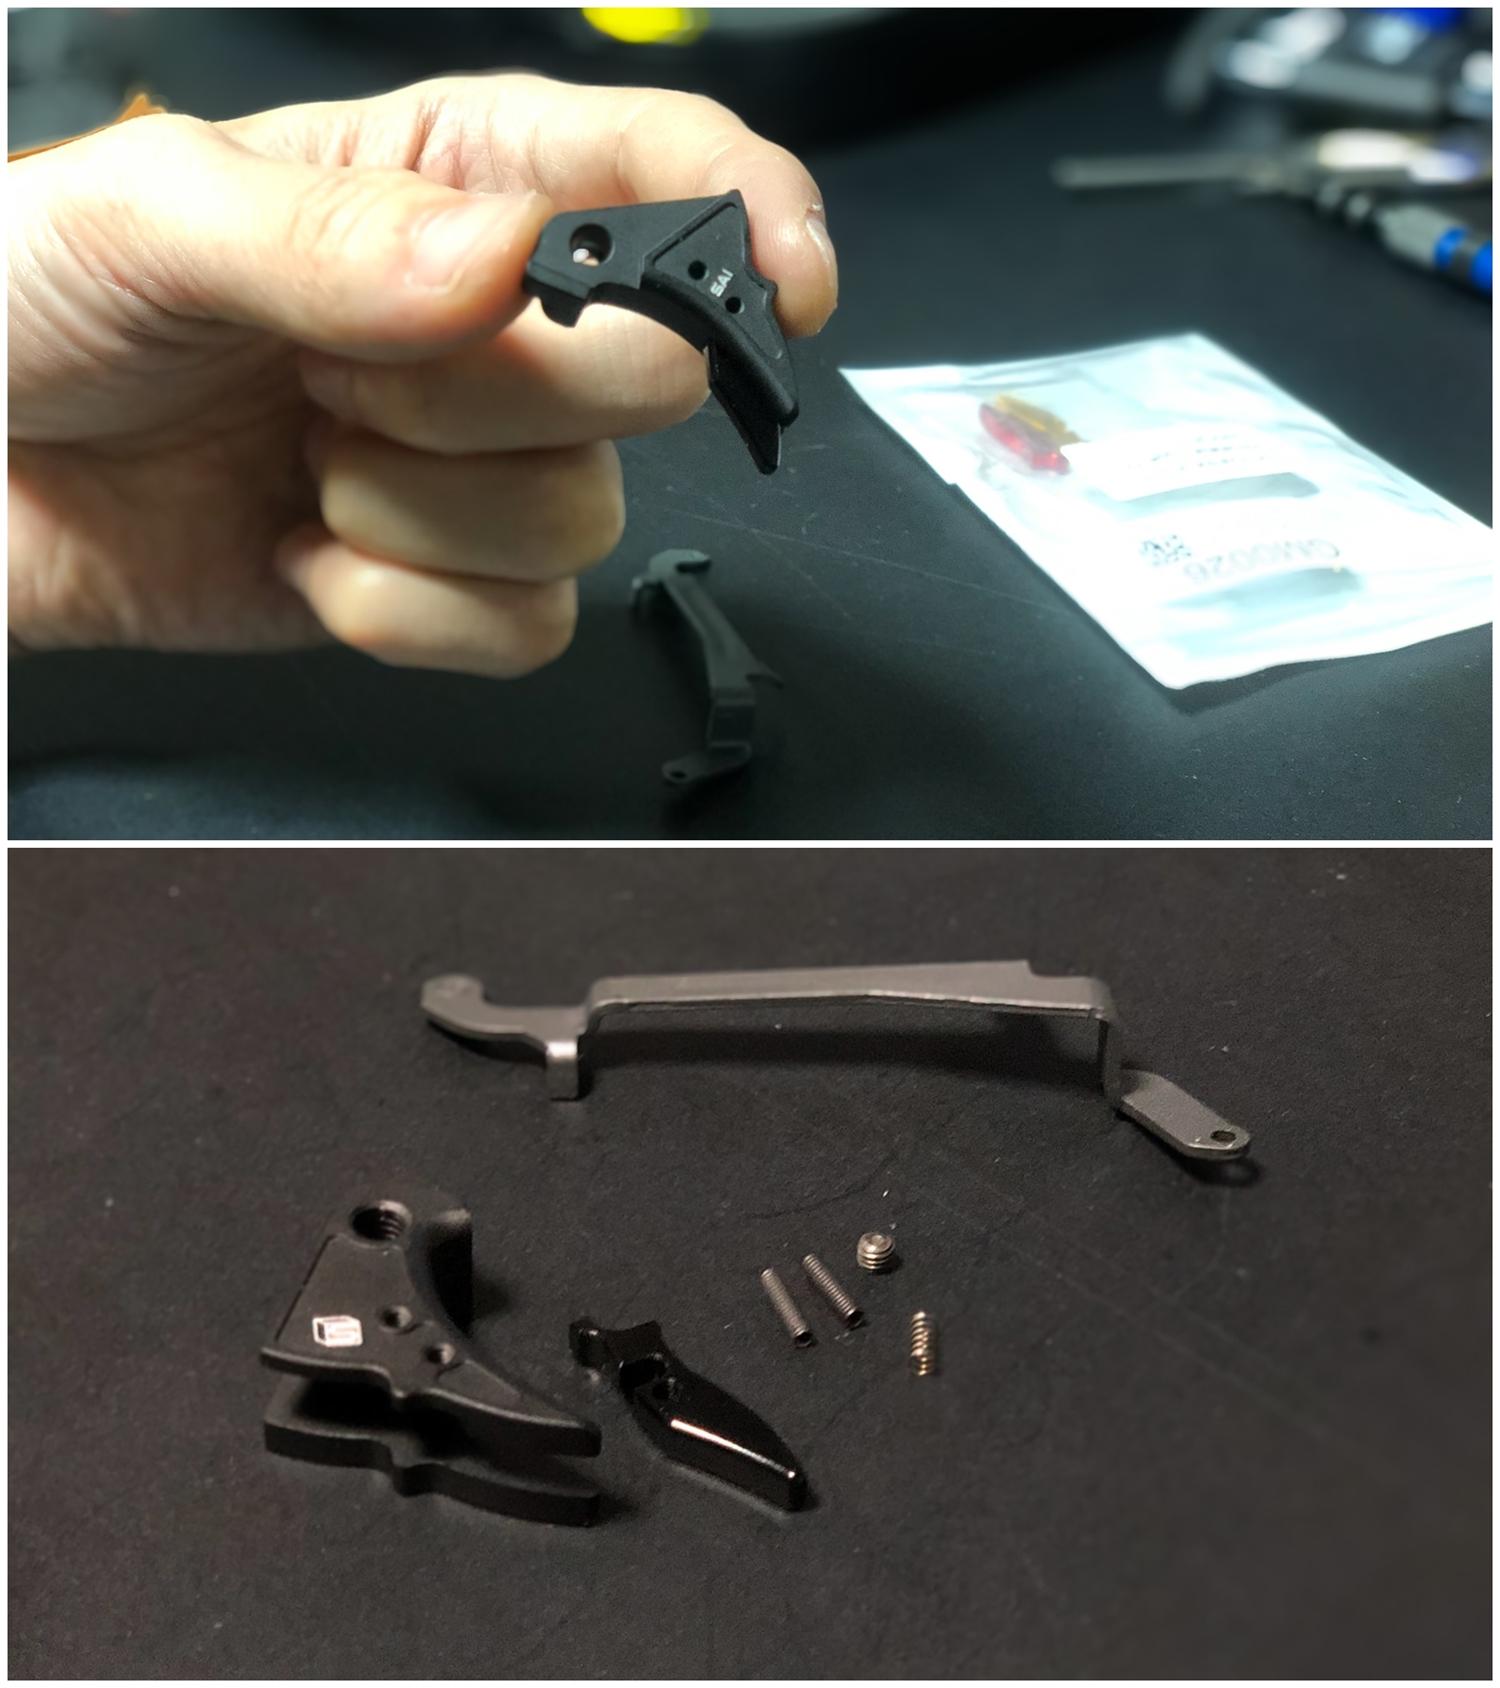 18 GunsModify GLOCK SAI アジャスタブルトリガー Ver3 GM0026 GM0079 に交換してみた! GLOCK G18C カスタム 購入 分解 取付 交換 取付方法 レビュー!!